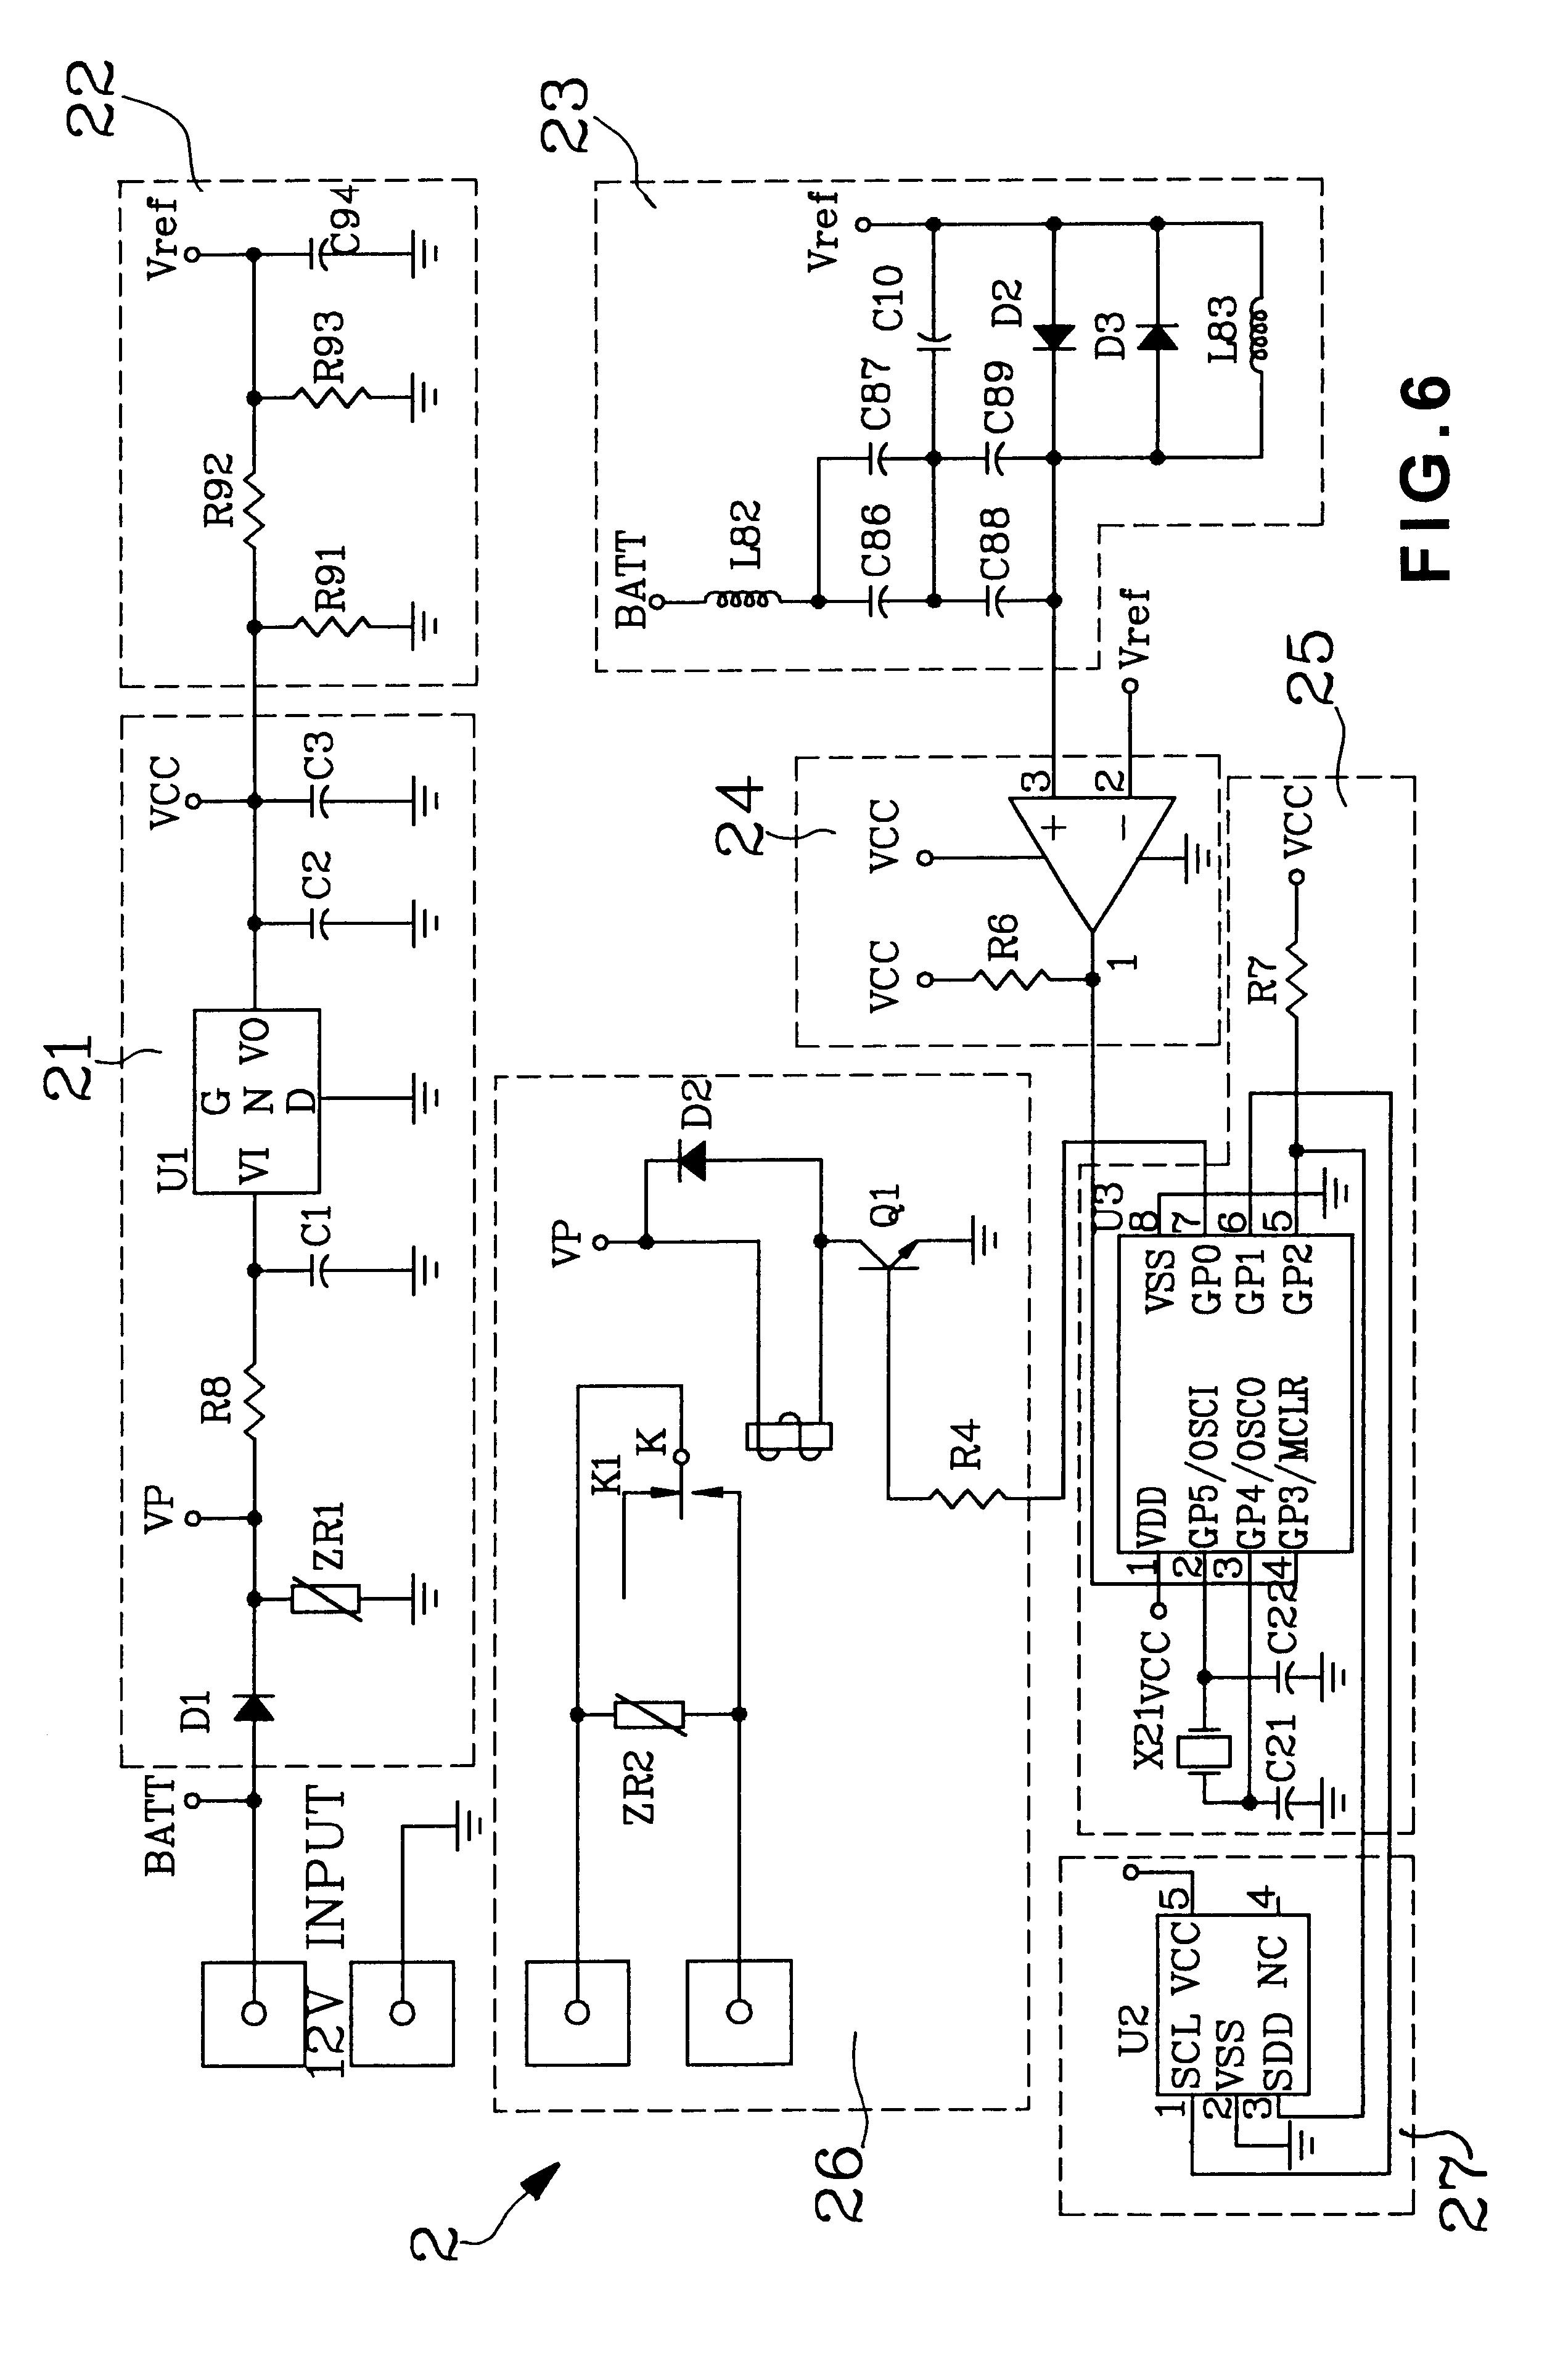 Toad Car Alarm Wiring Diagram 1991